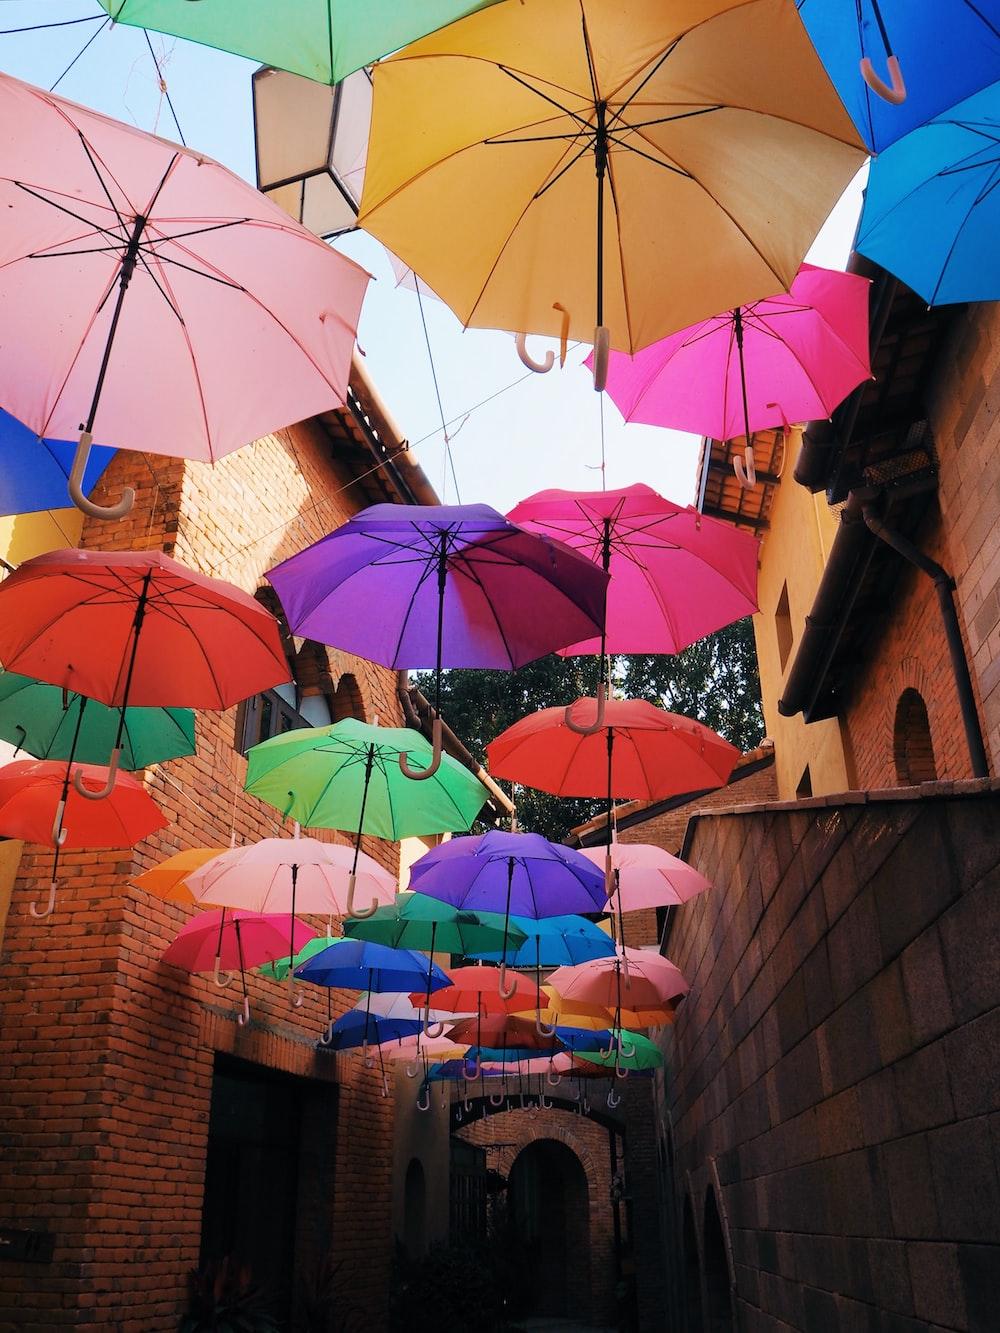 assorted-color umbrella hanging beside building